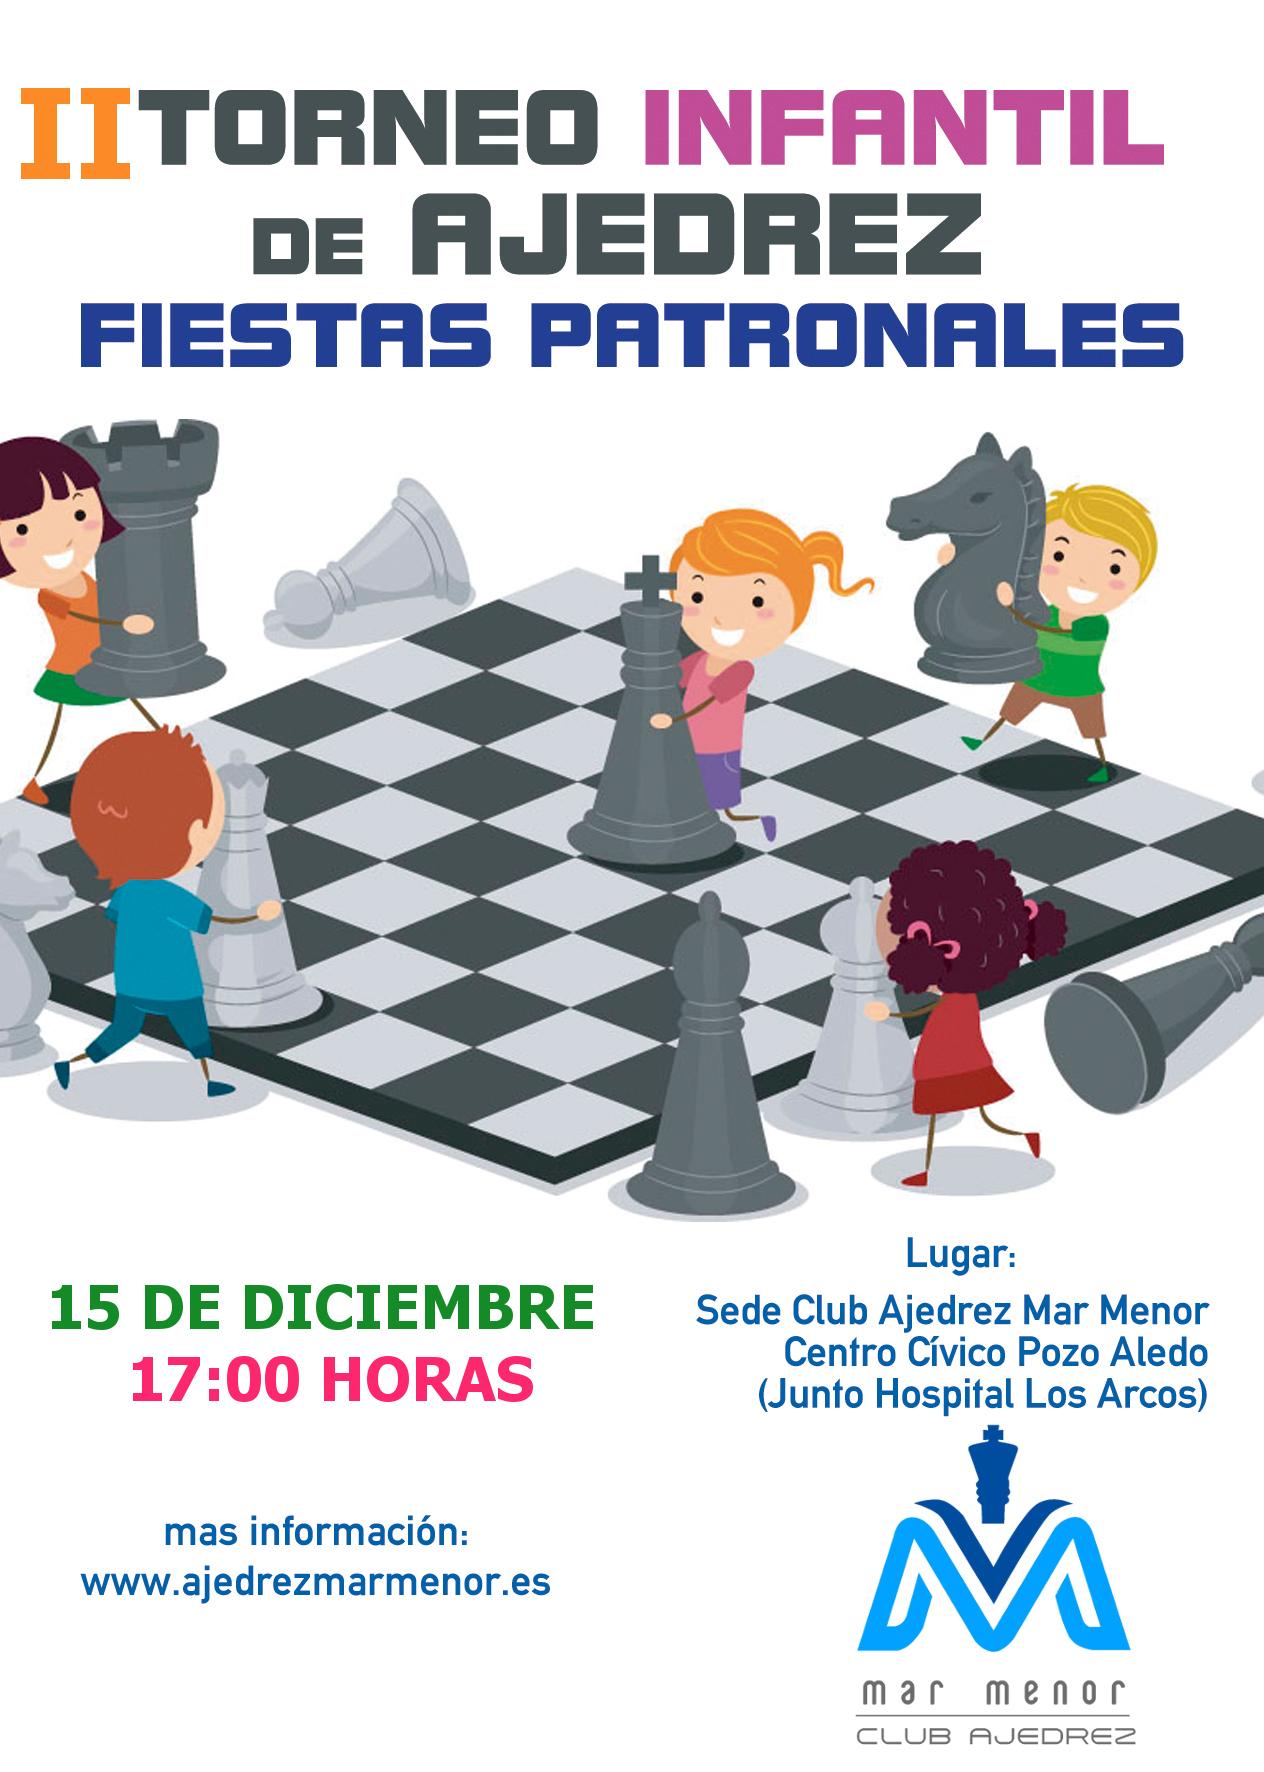 II Torneo Infantil Fiestas Patronales